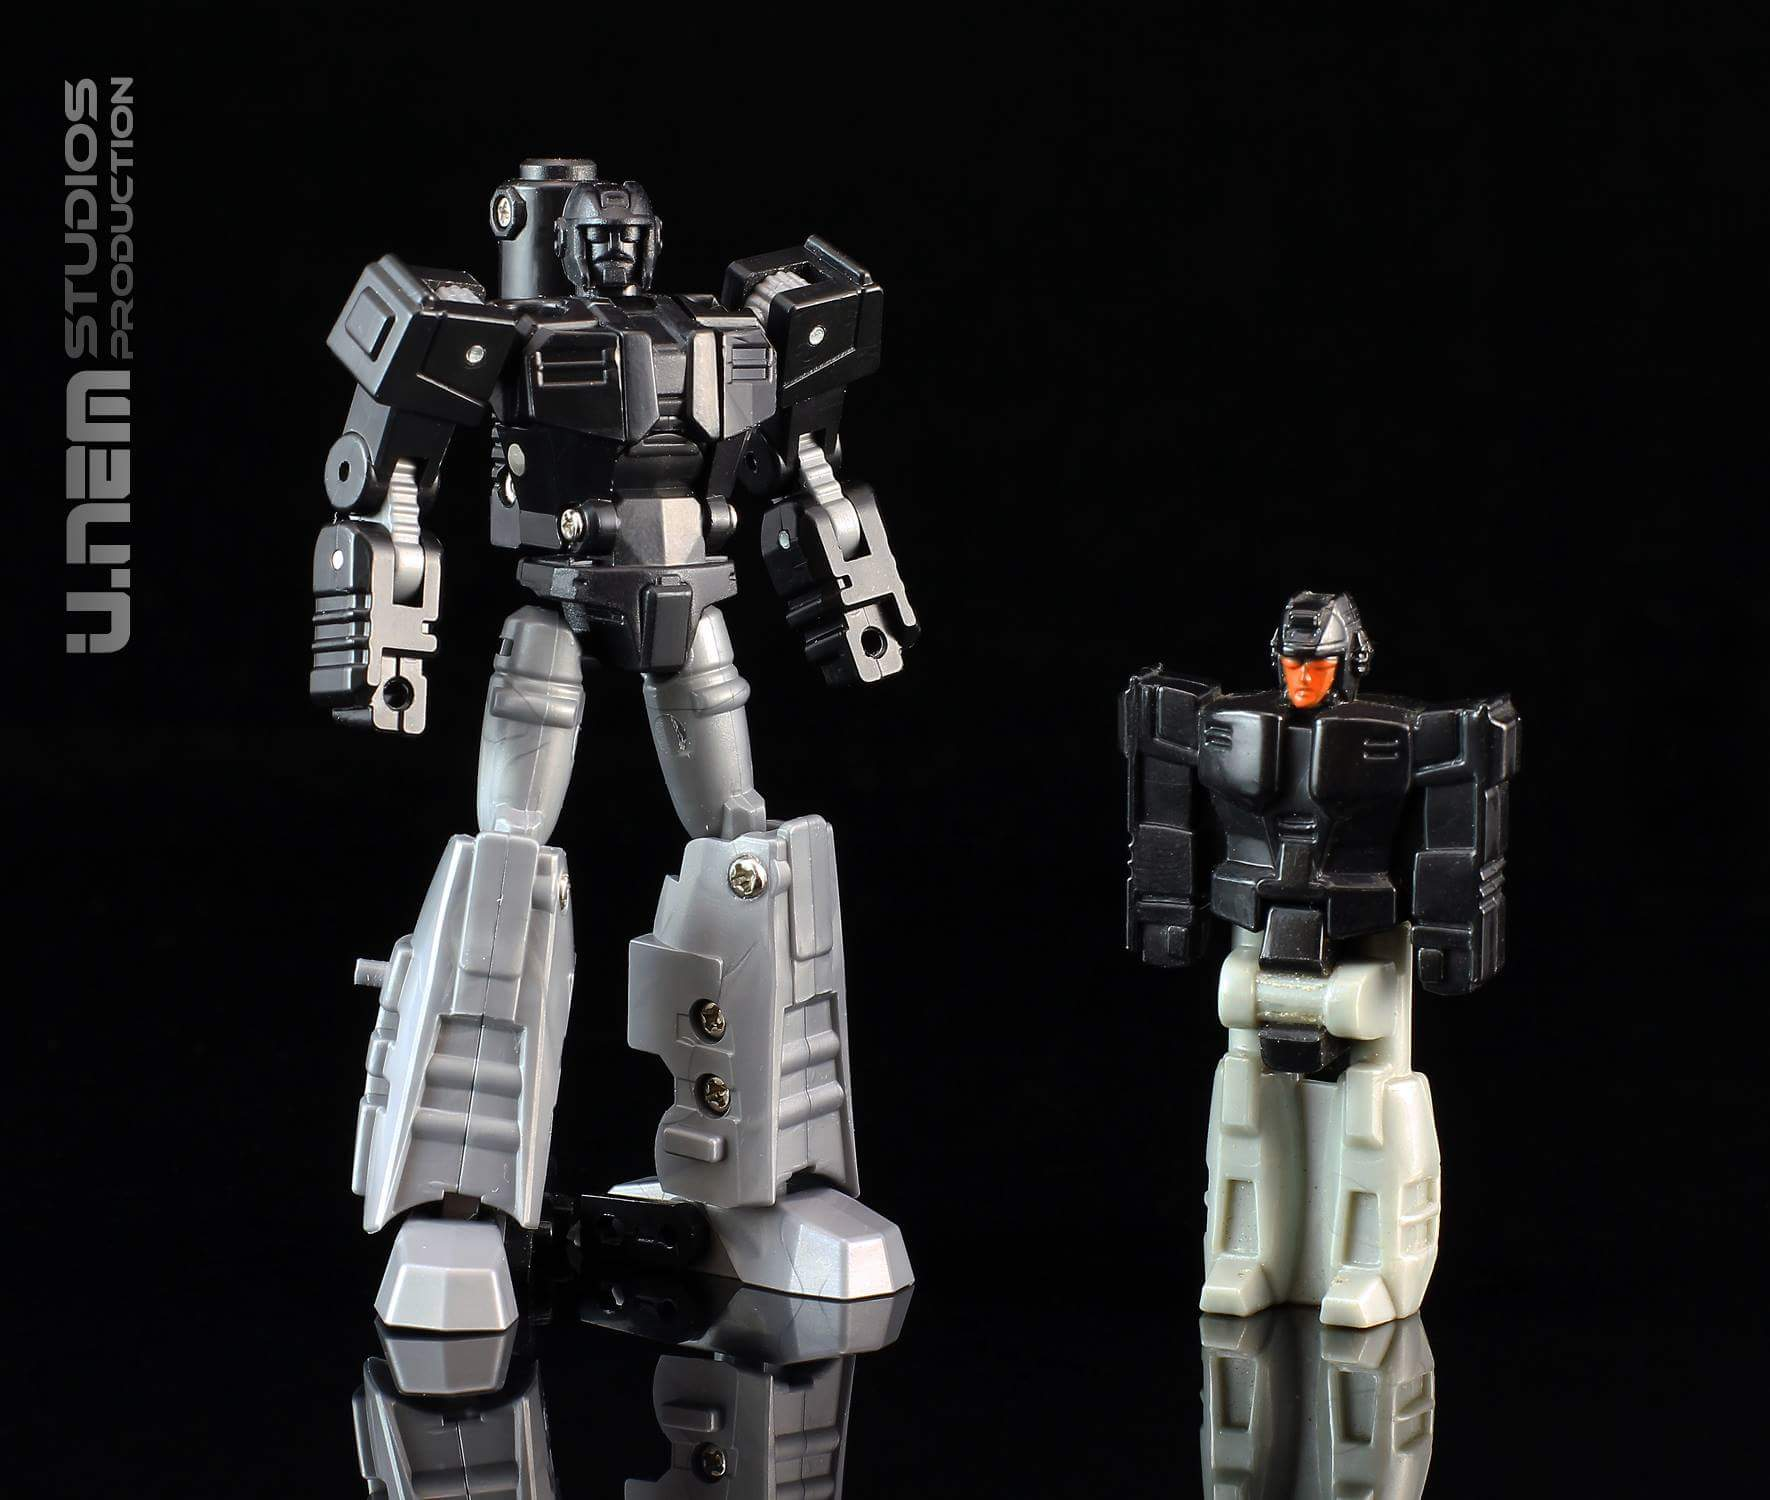 [X-Transbots] Produit Tiers - MX-III Eligos - aka Cyclonus - Page 3 EixBtGab